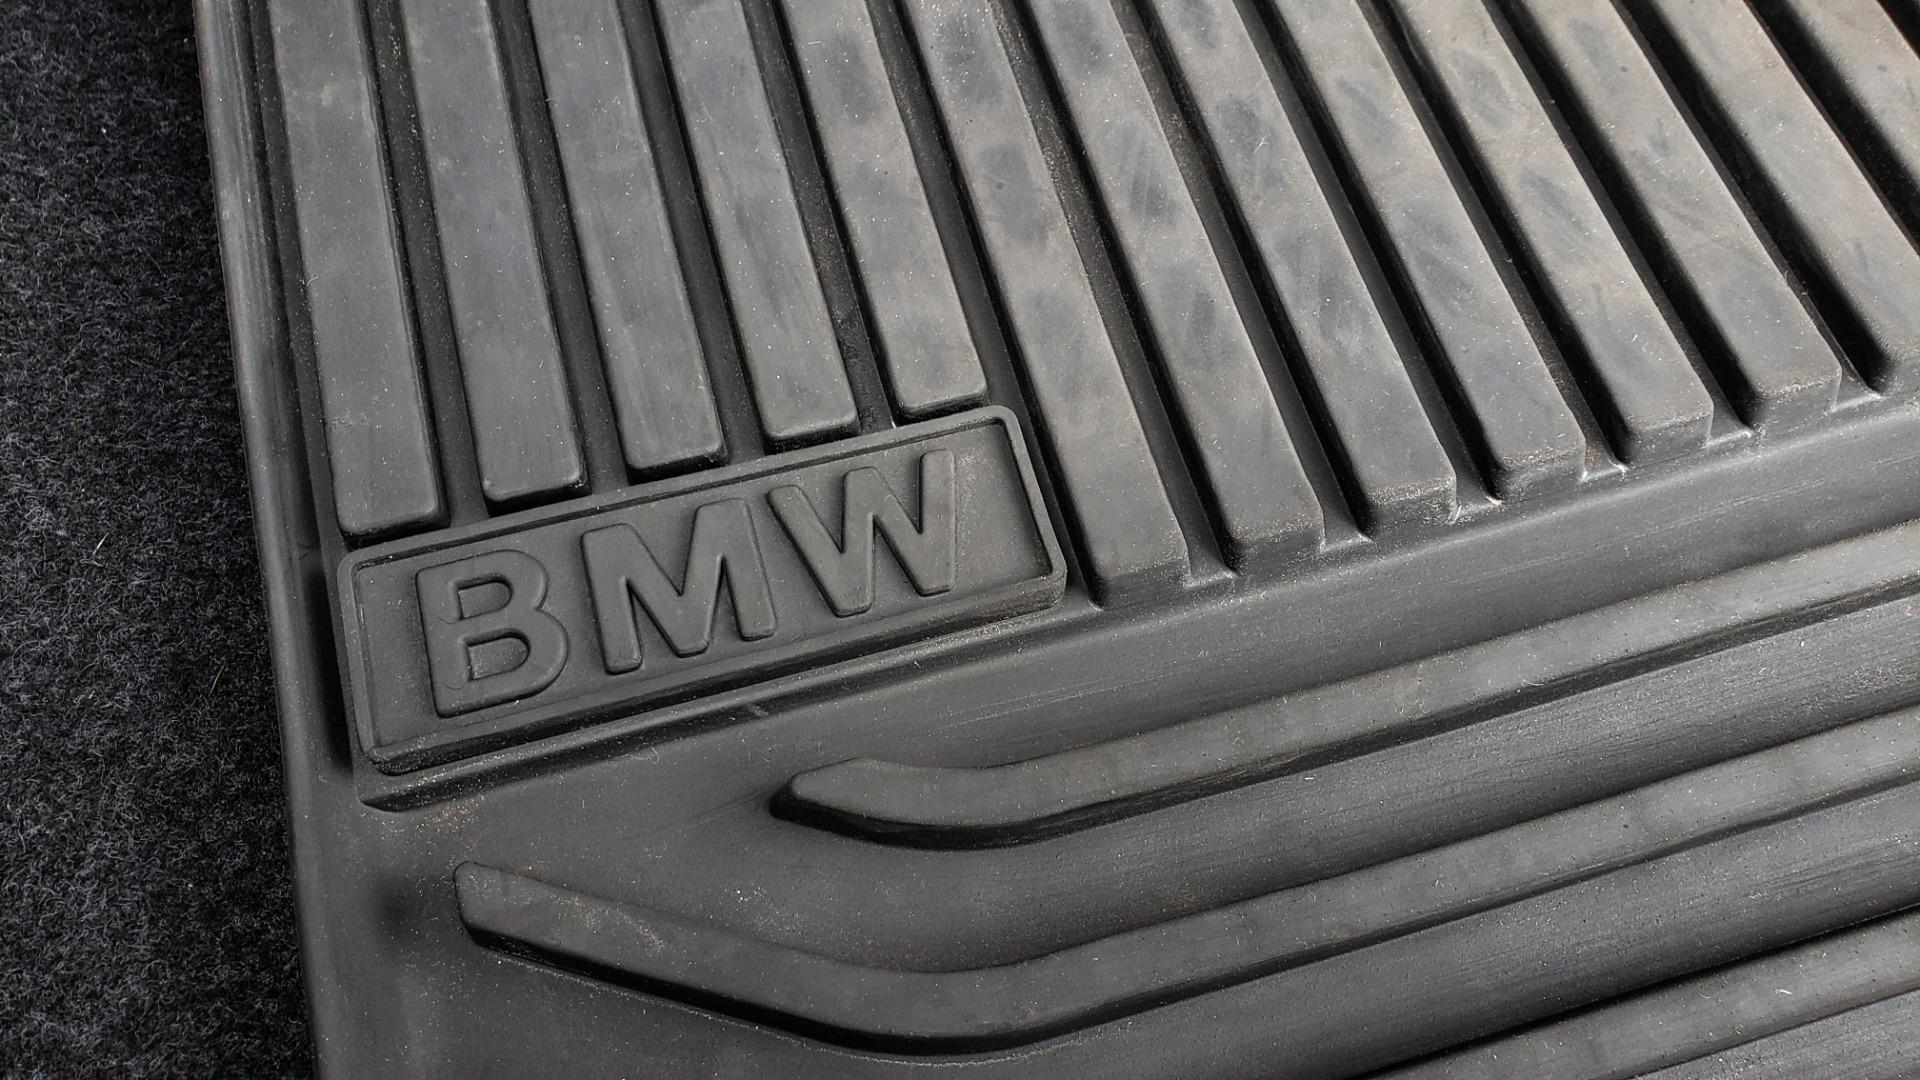 Used 2012 BMW 5 SERIES 550I M SPORT / NAV / CONV PKG / SUNROOF / PREM SND / REARVIEW for sale Sold at Formula Imports in Charlotte NC 28227 17